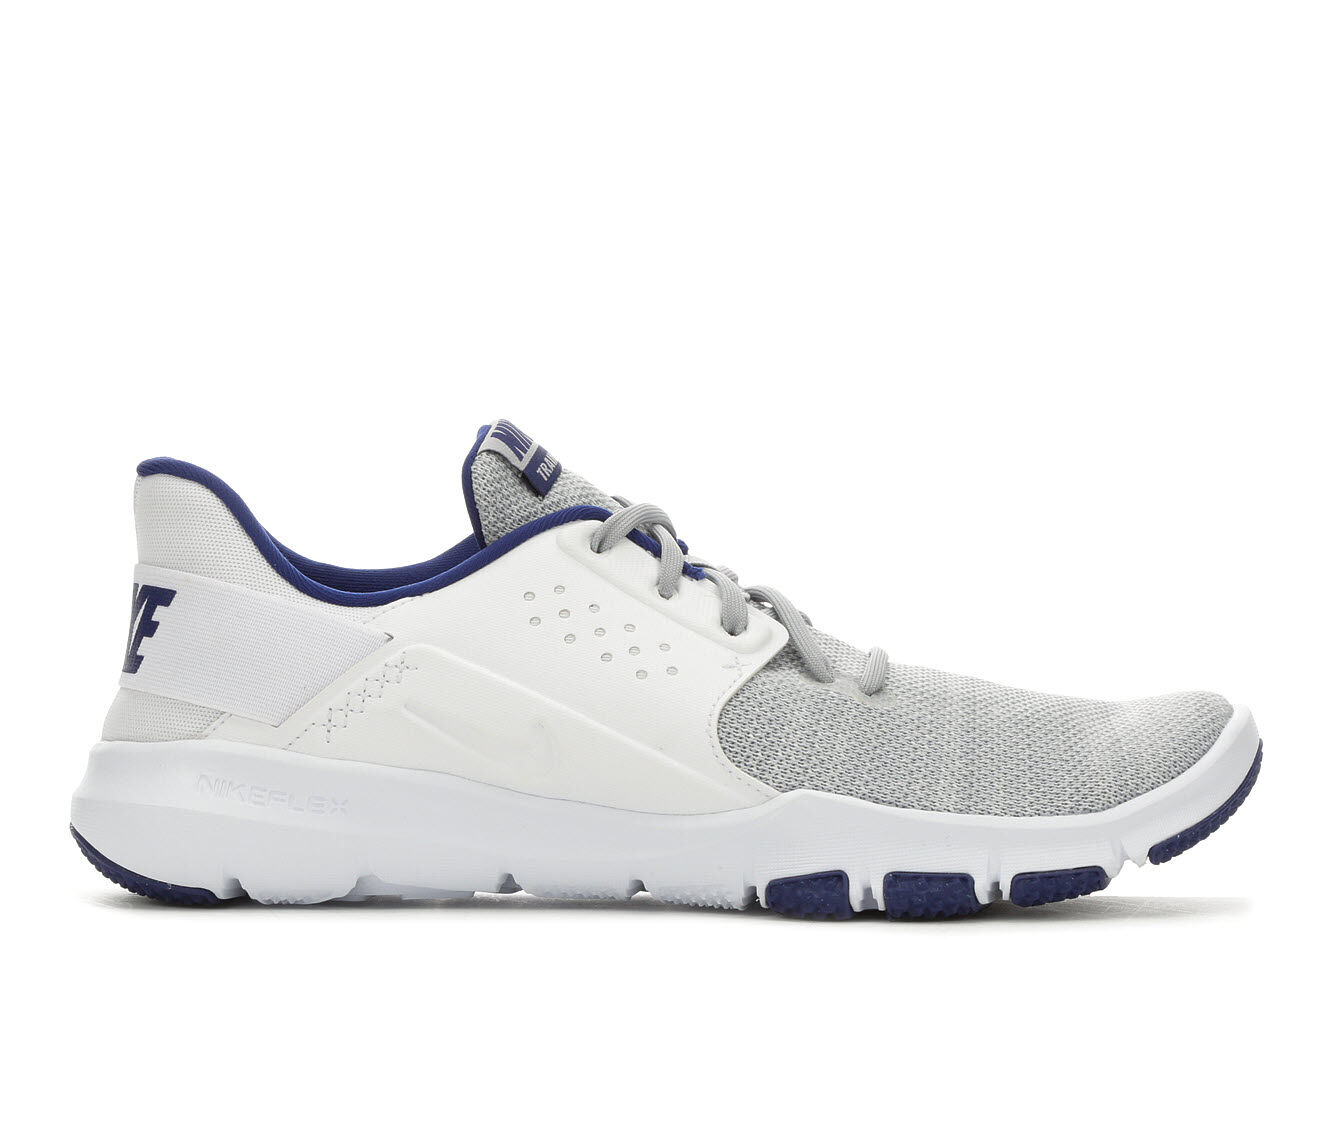 Men's Nike Flex Control TR3 Training Shoes Wht/Gry/Blu 004